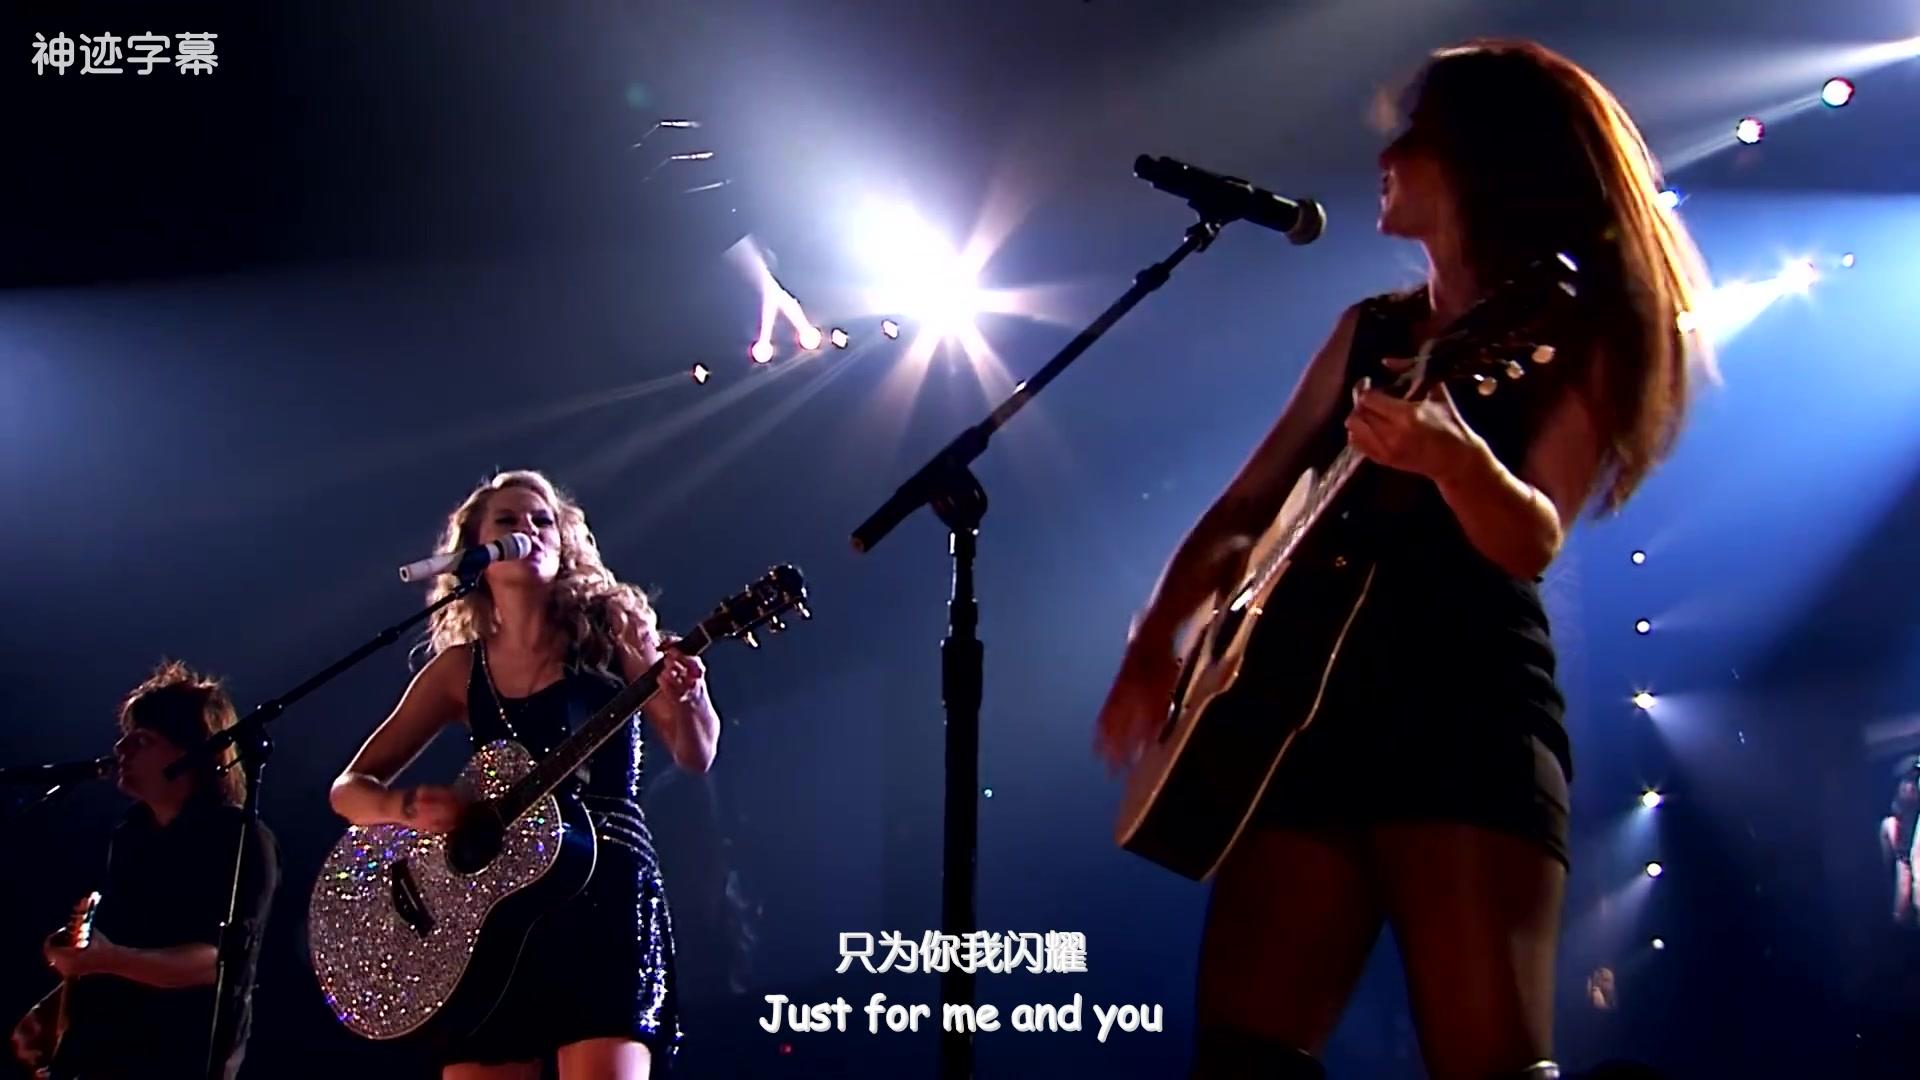 Taylor Swift u0026 Paula Fernandes  Long Live MV 中英葡字幕   小霸霸种草TV @神迹字幕